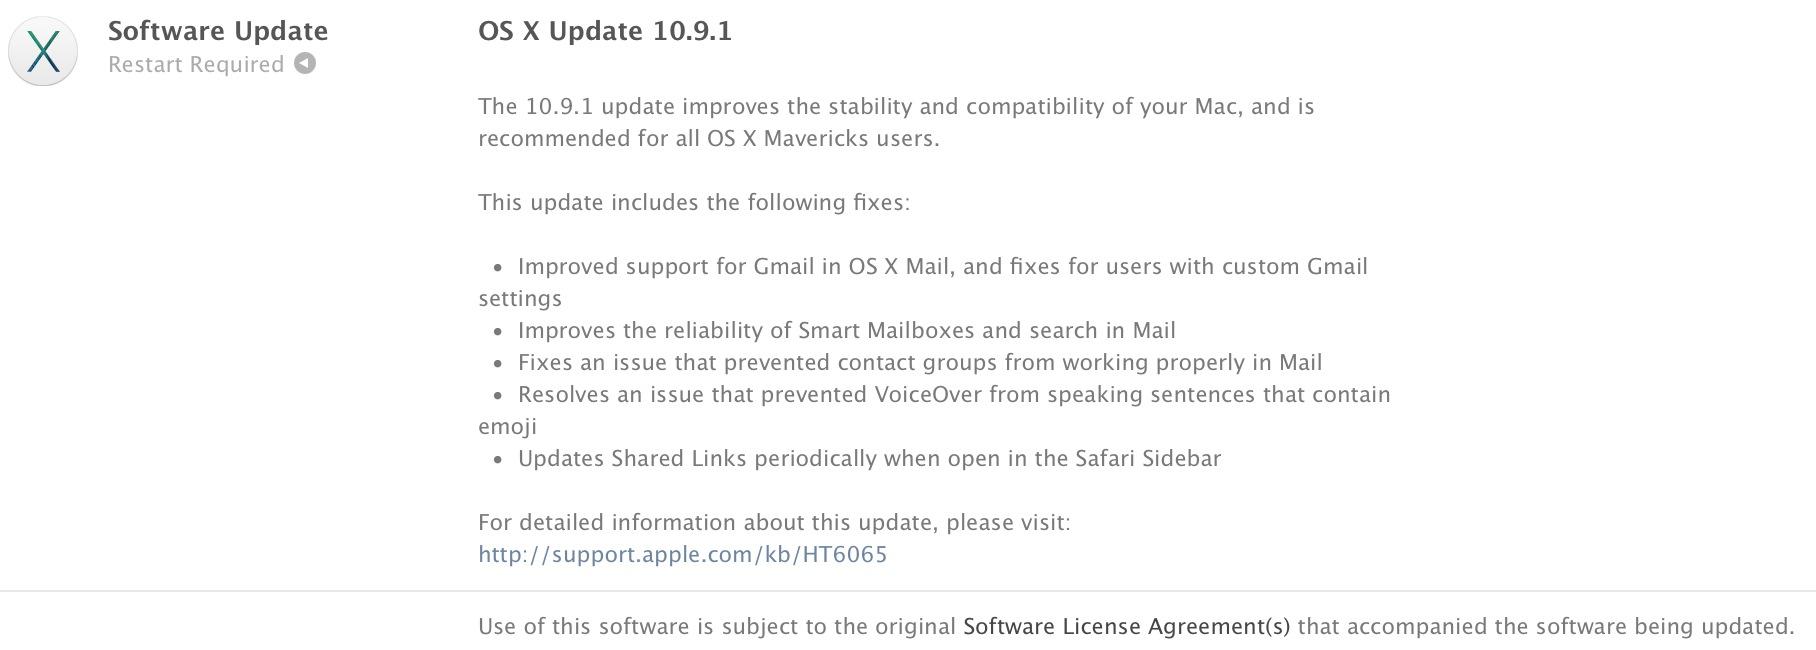 osx 10.9.1